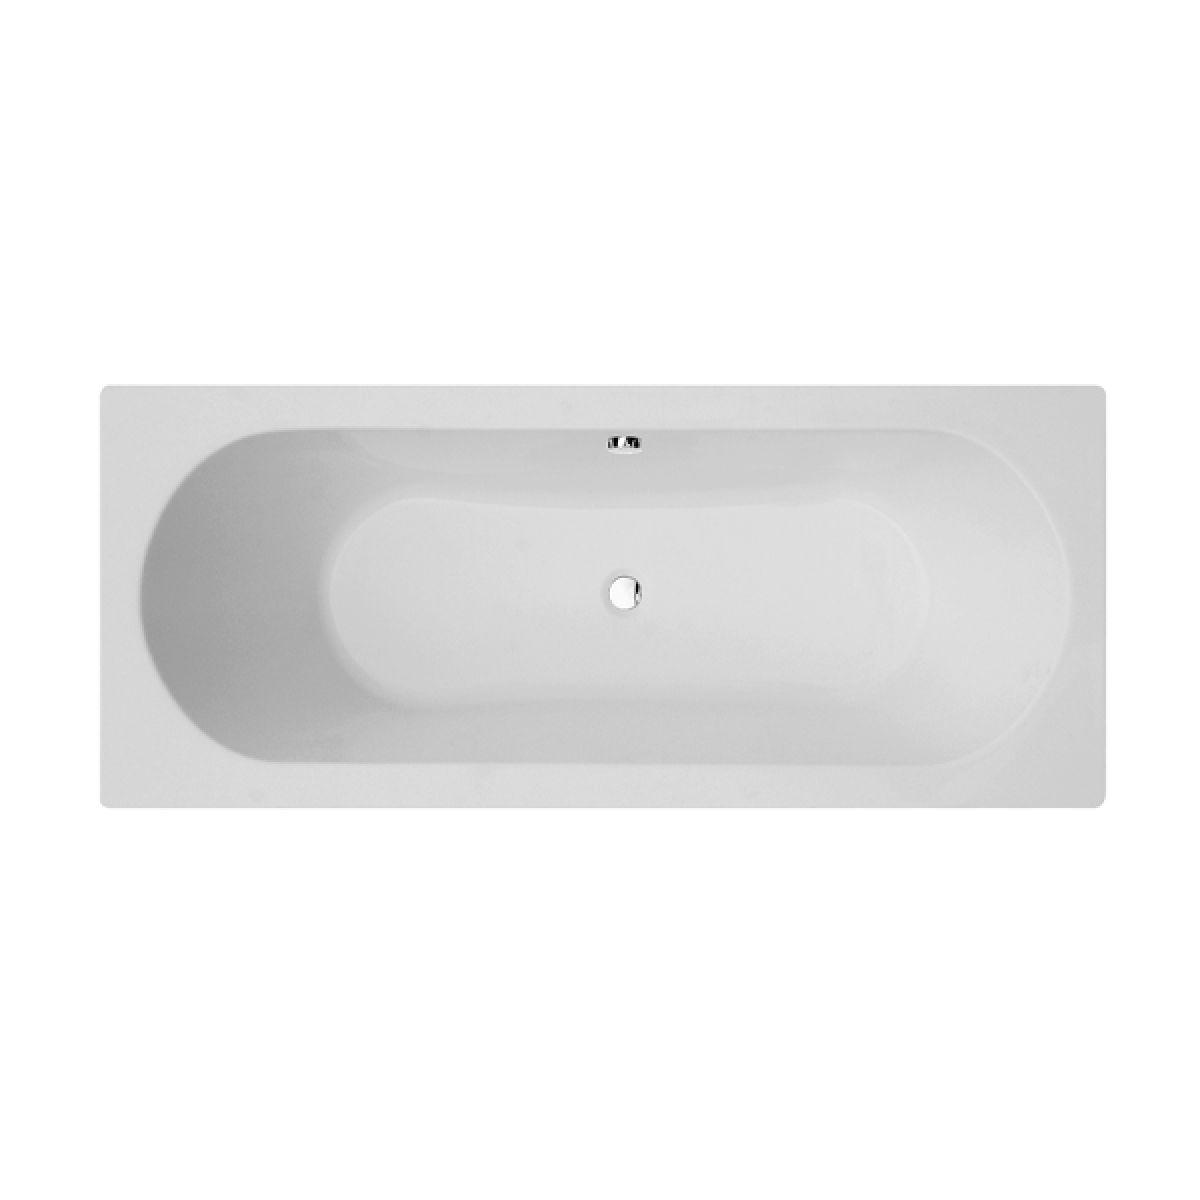 Frontline Duo Luxury Double Ended Bath